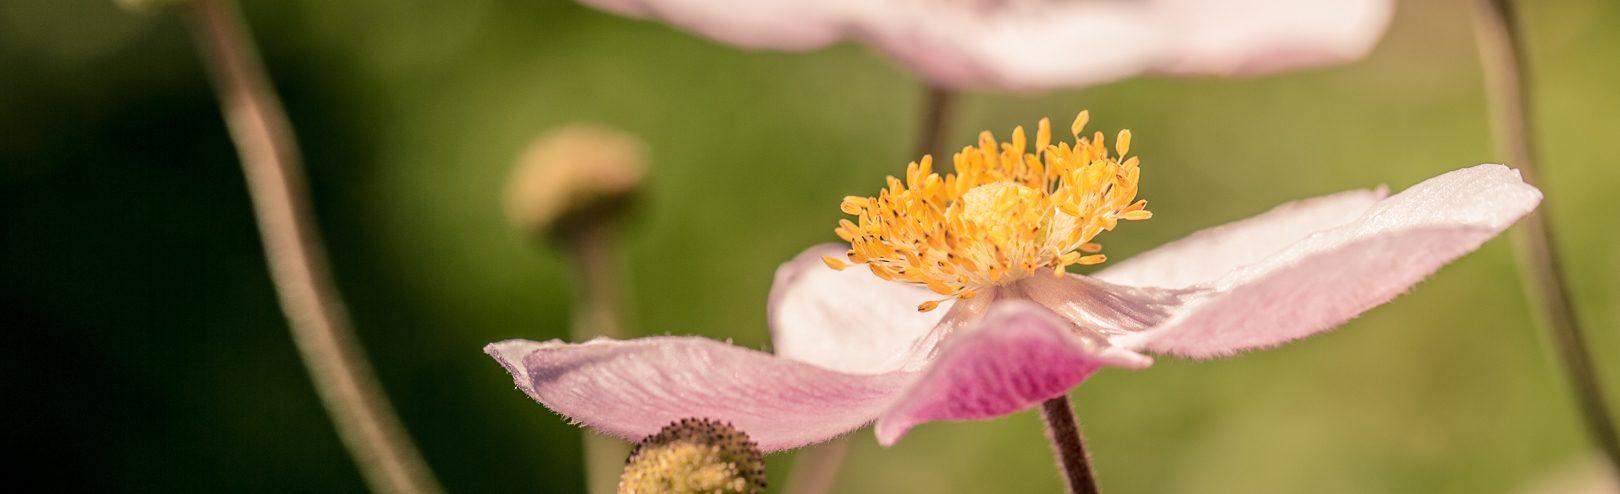 Herbst-Anemone (Anemone hupehensis)